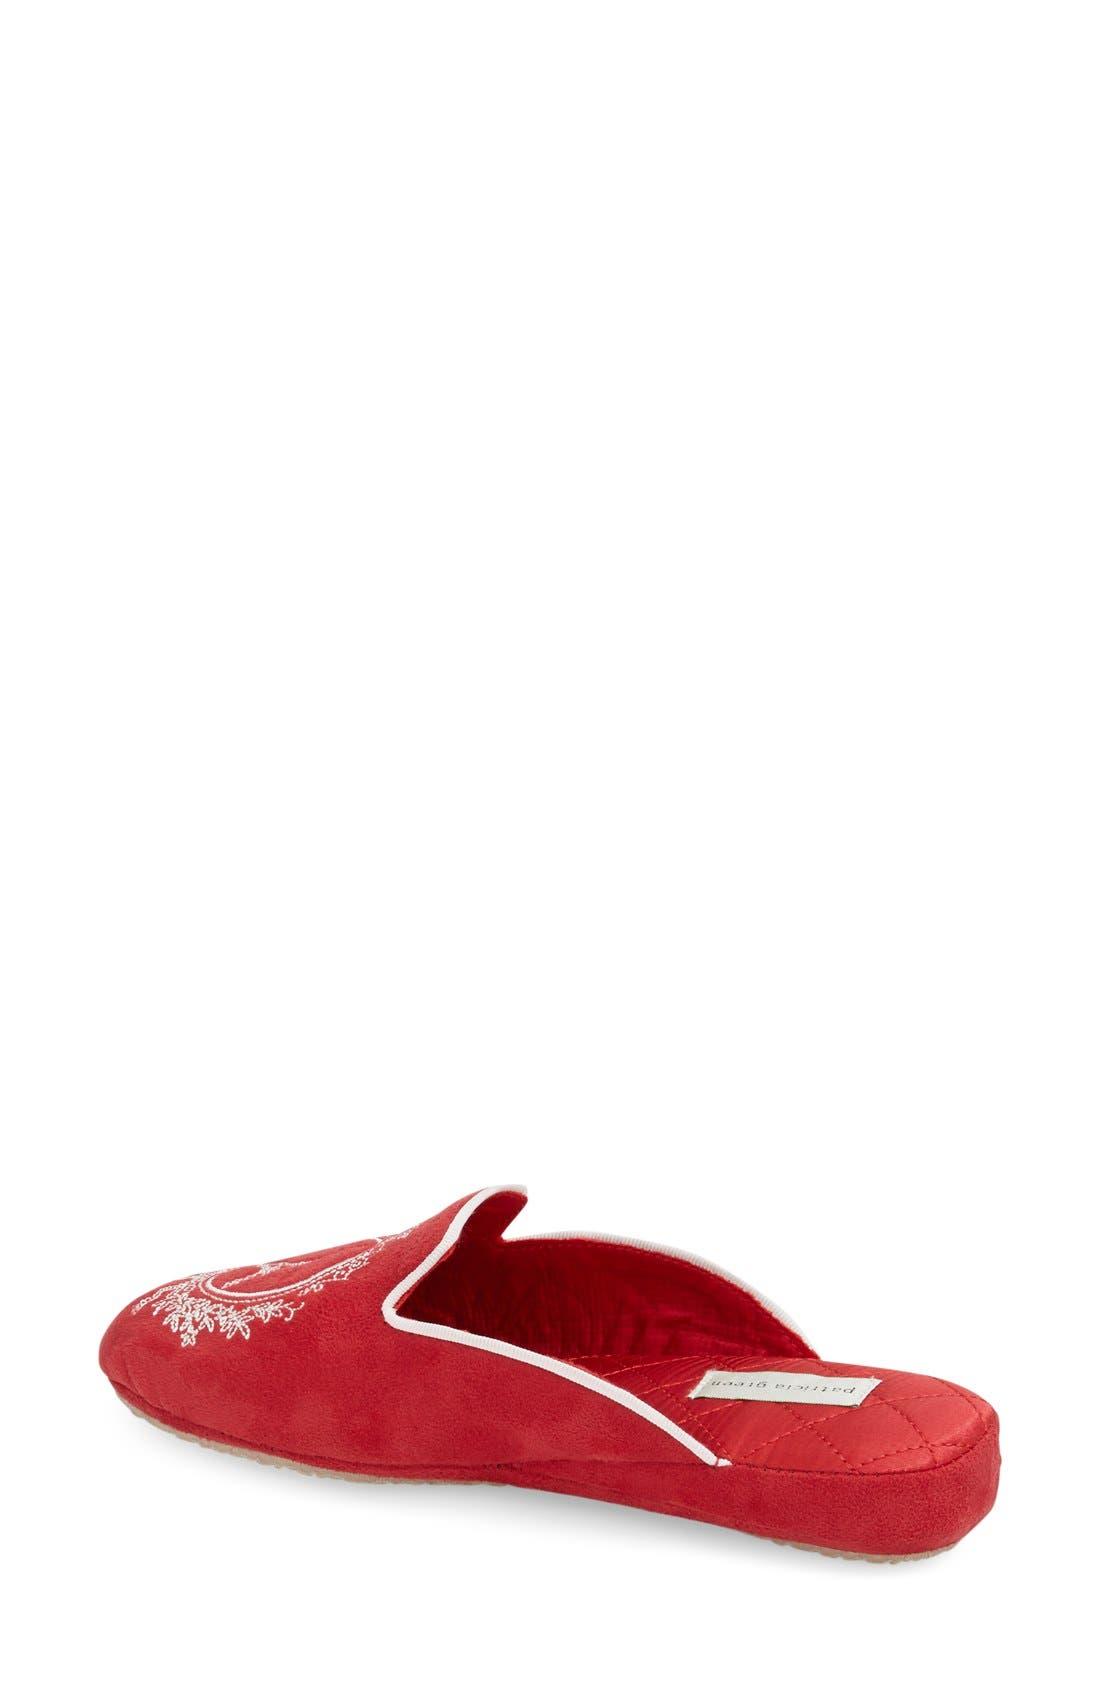 'Paris' Slipper,                             Alternate thumbnail 2, color,                             Red Suede